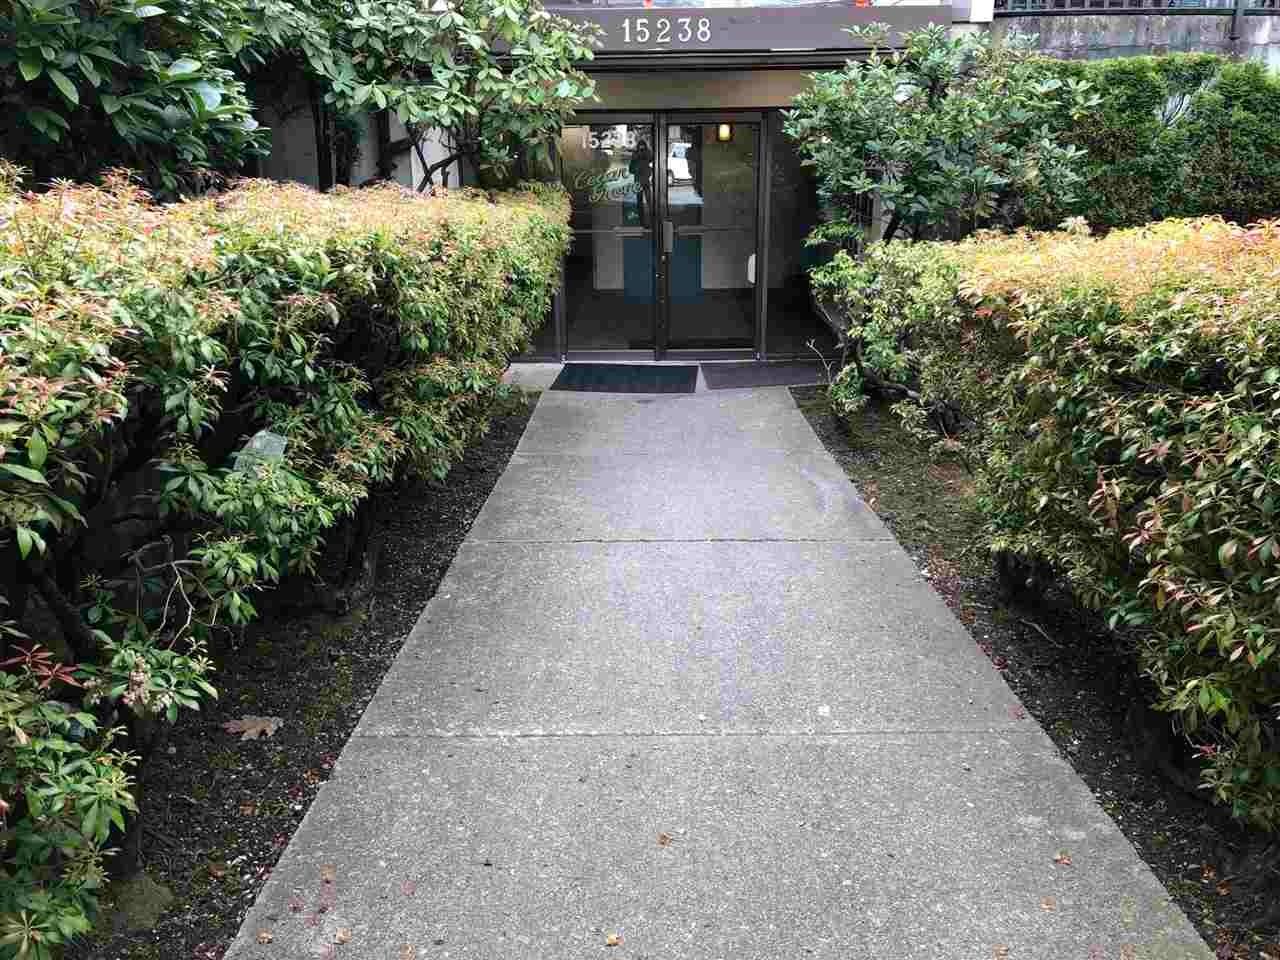 304 15238 100 AVENUE - Guildford Apartment/Condo for sale, 1 Bedroom (R2576105) - #22